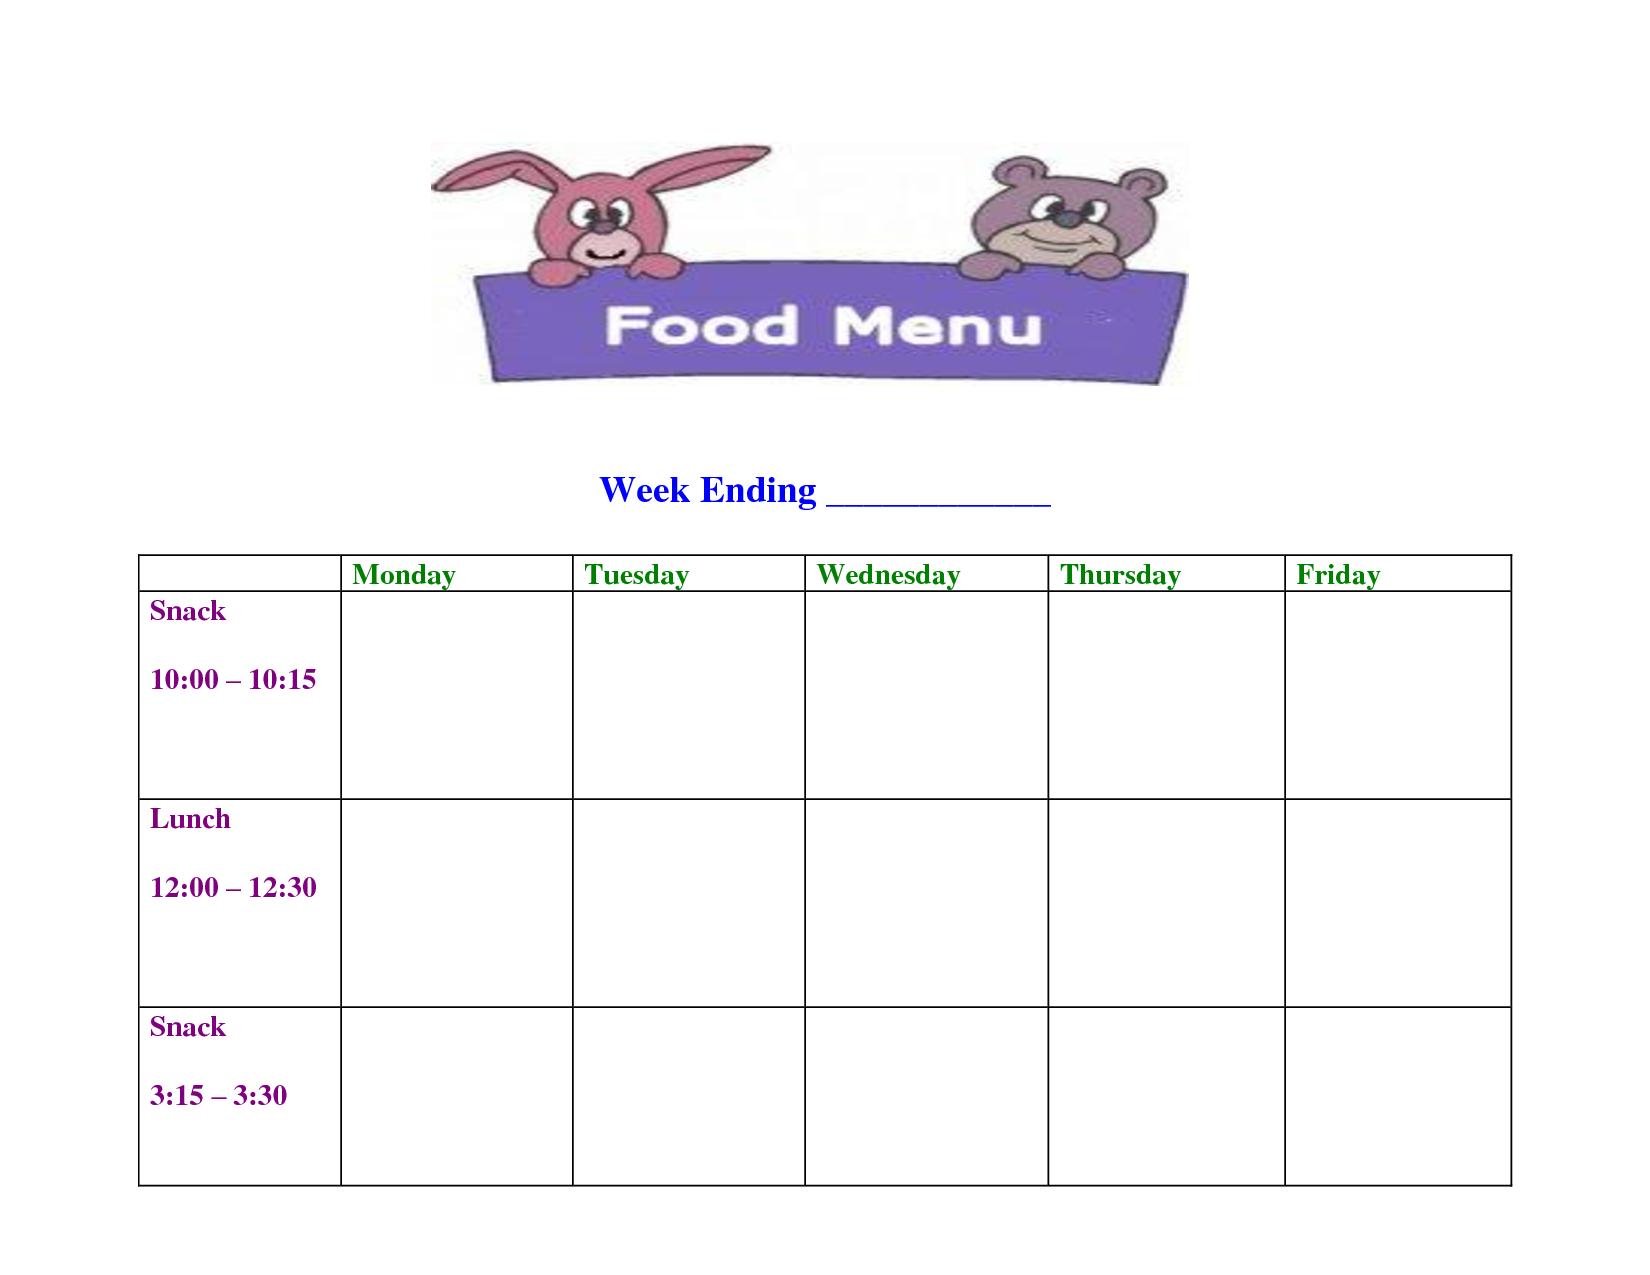 Daycareblankmenutemplate  Layouts  Daycare Menu Weekly Menu Inside Free School Lunch Menu Templates